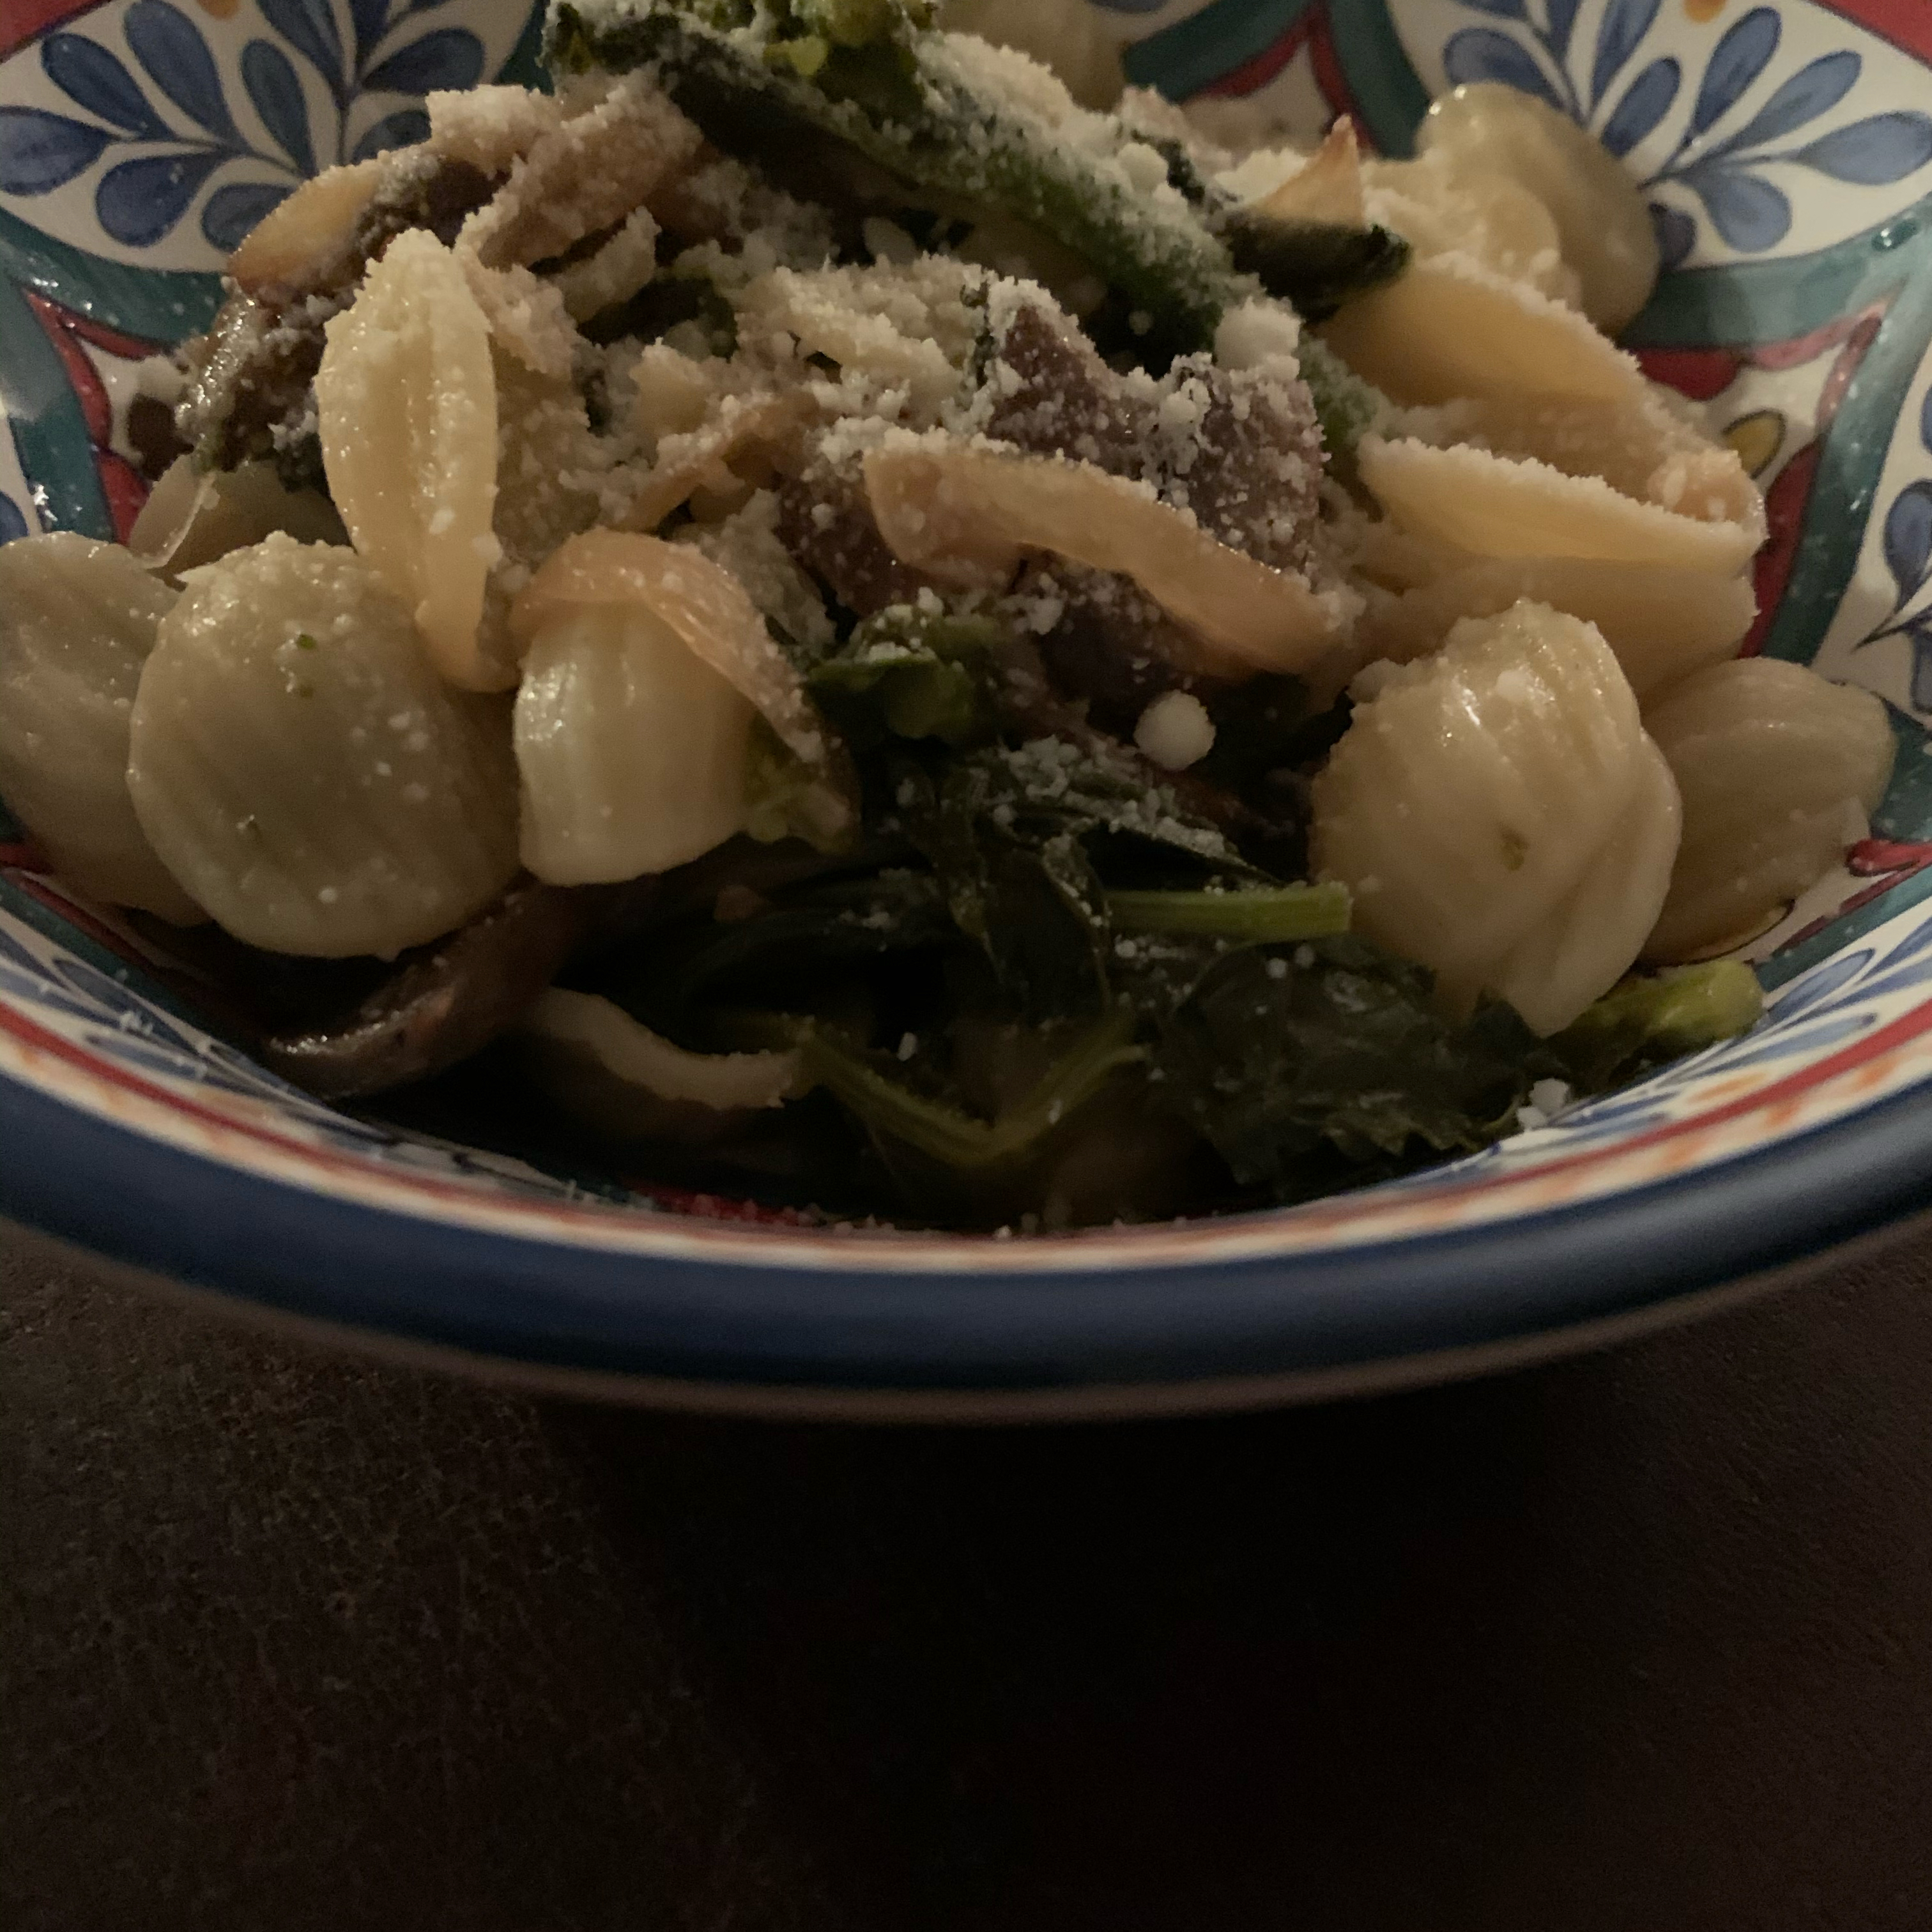 Broccoli Rabe with Portobello Mushroom Dom F